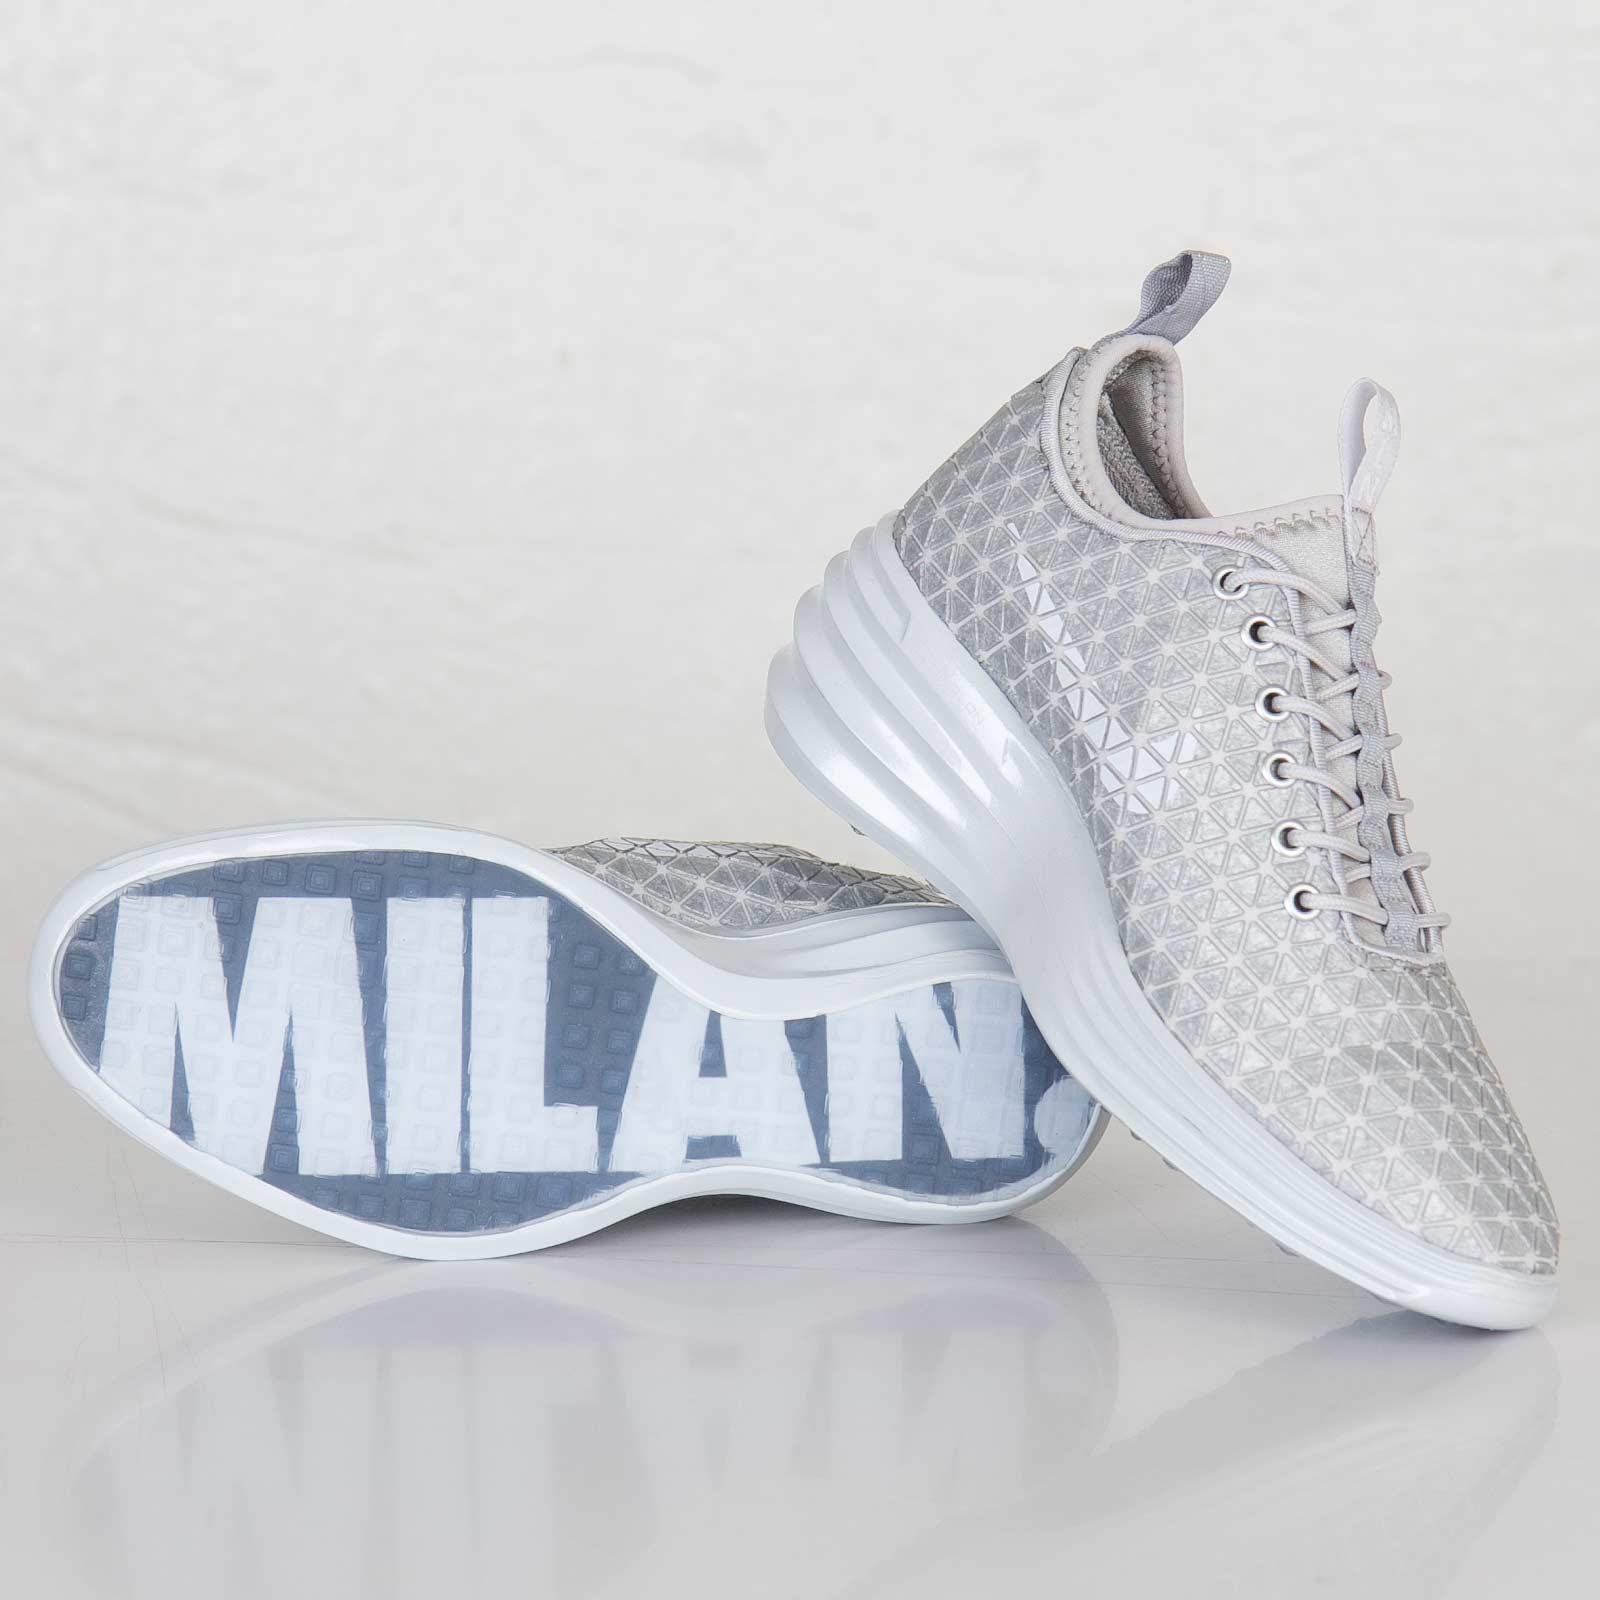 separation shoes 93858 81166 Nike Wmns Lunarelite Sky Hi FW QS - 9. Close